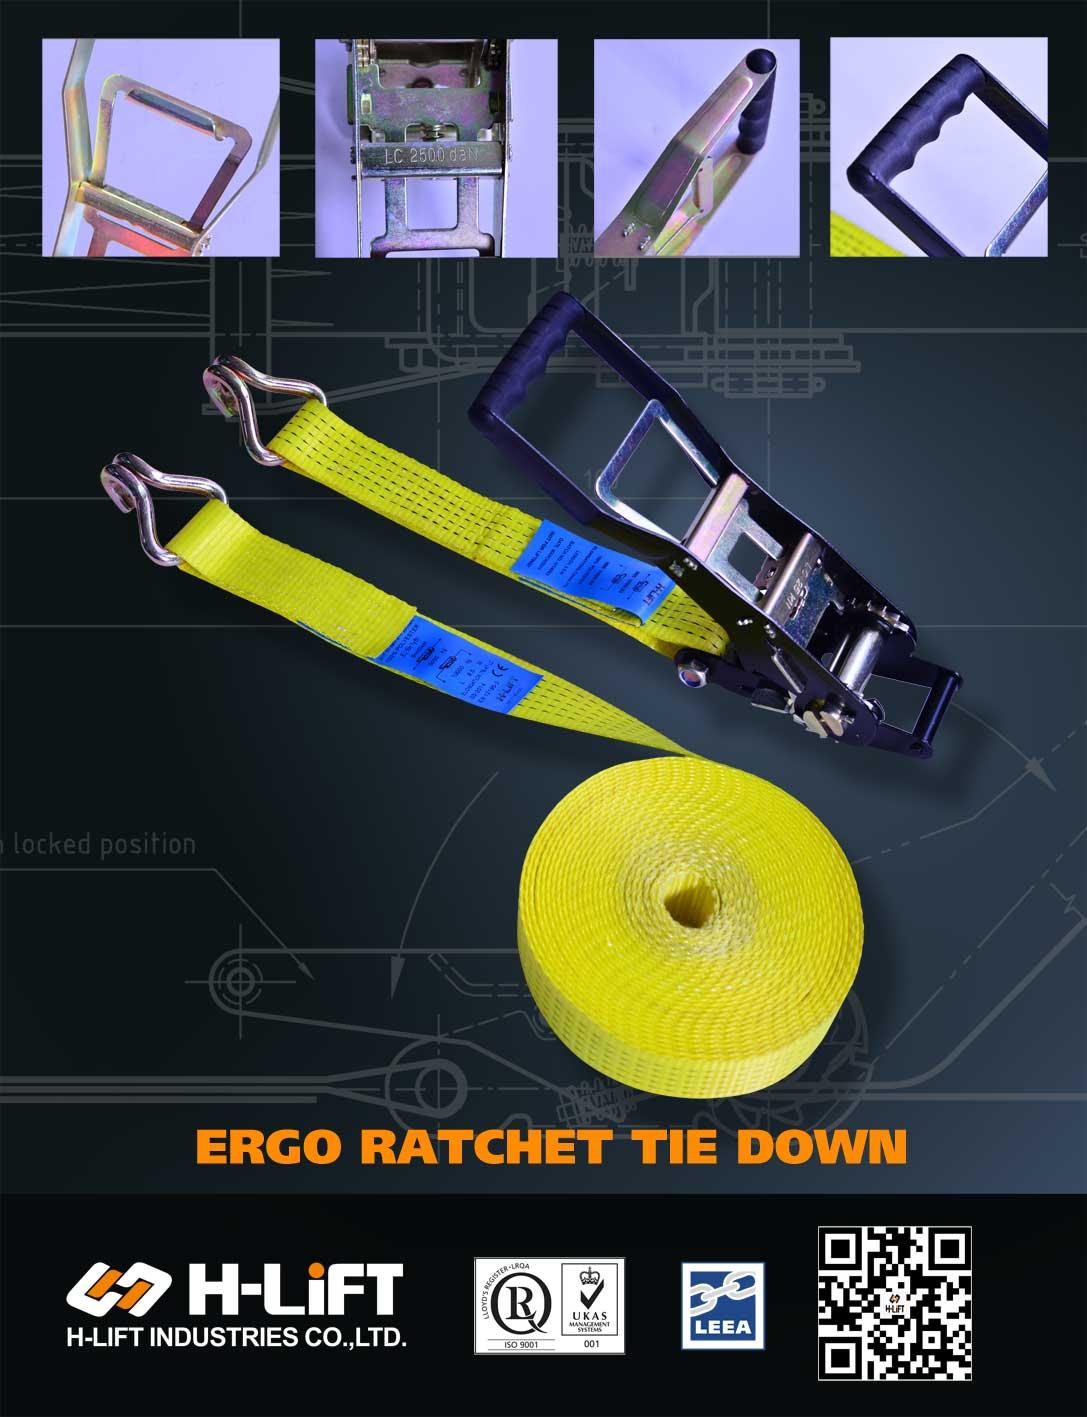 Newly Develped Ergo Ratchet Tie down